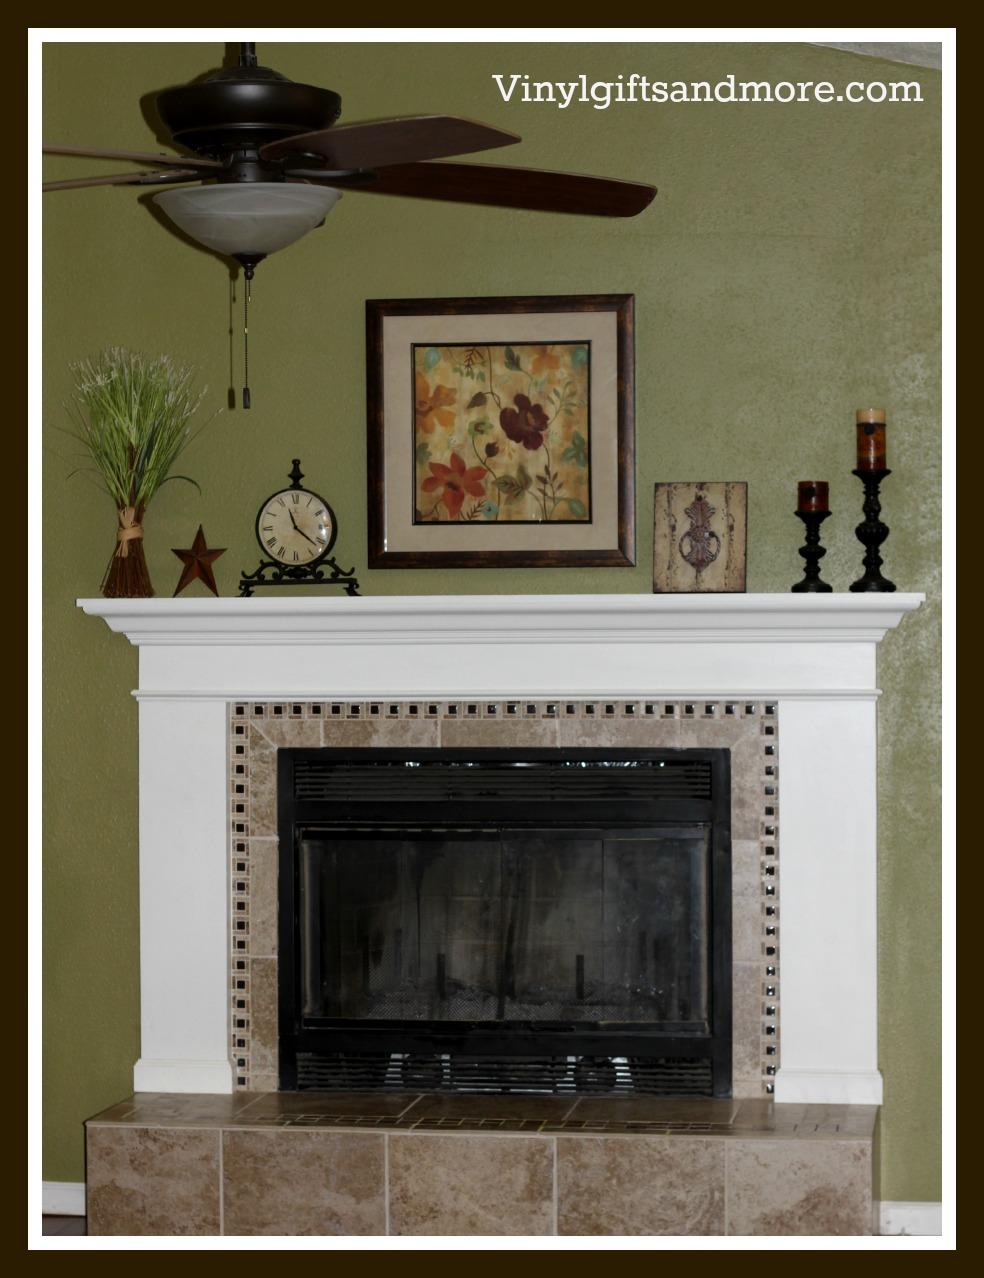 Super Saturday Crafts: Fireplace Remodel